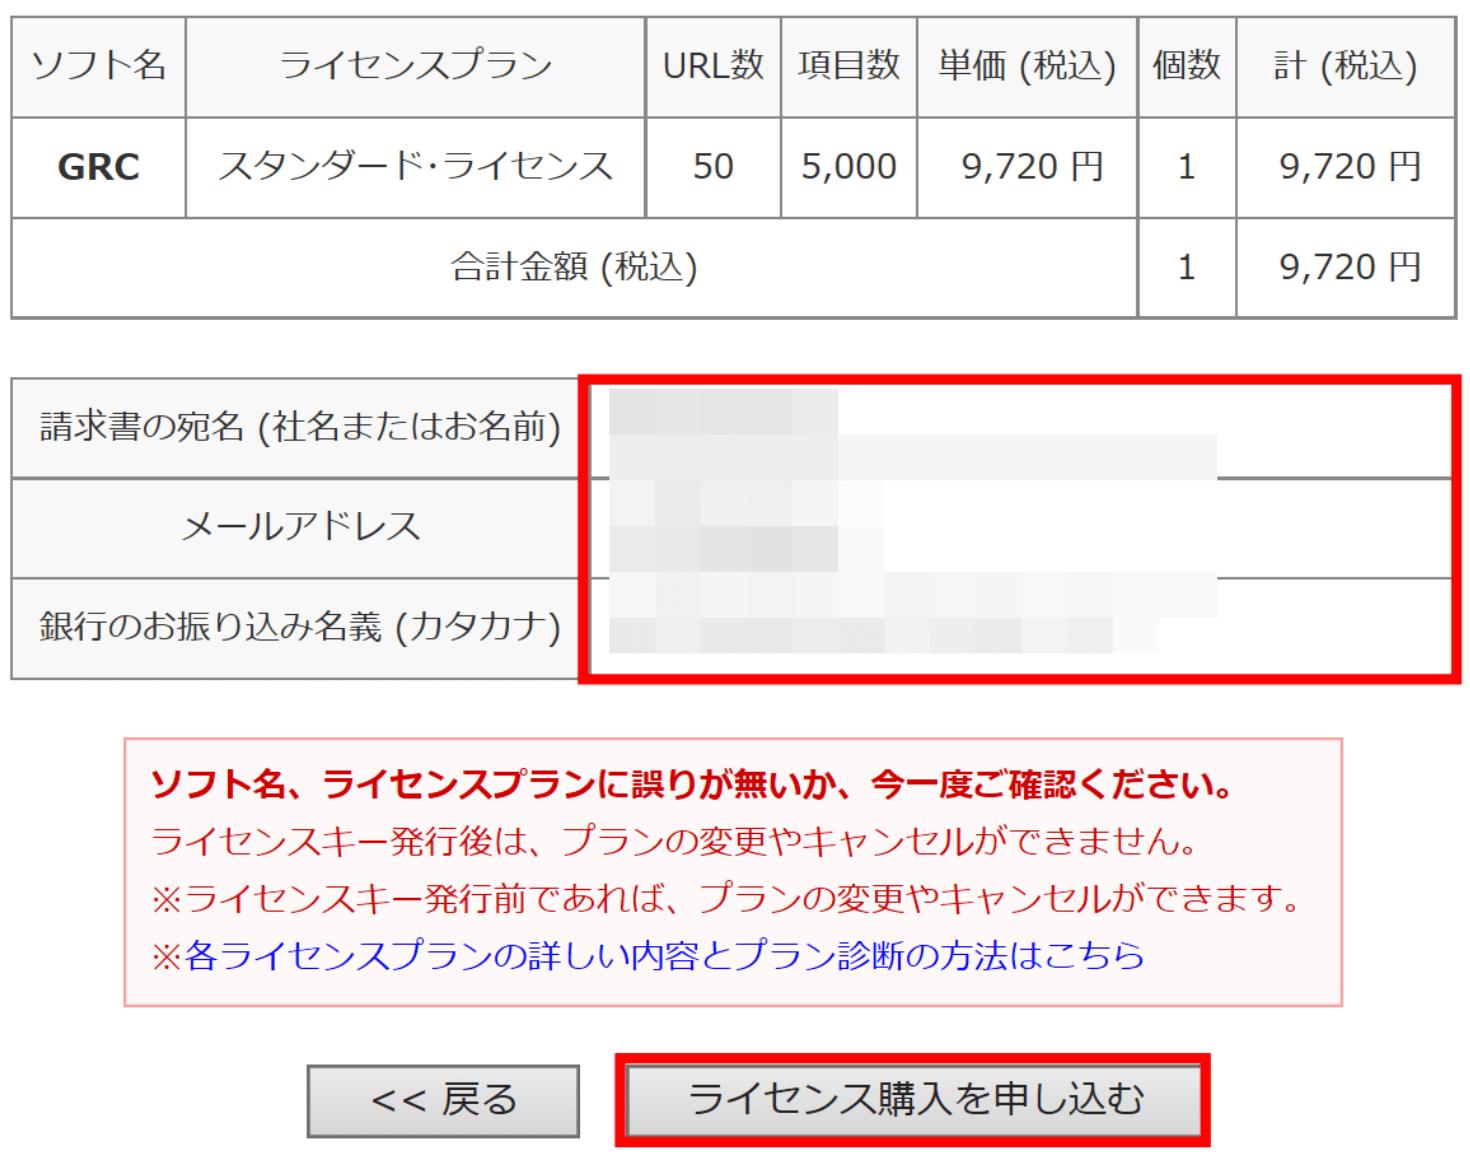 GRCのライセンスプランと個人情報に誤りがないか再度確認後、『ライセンス購入を申し込む』をクリック